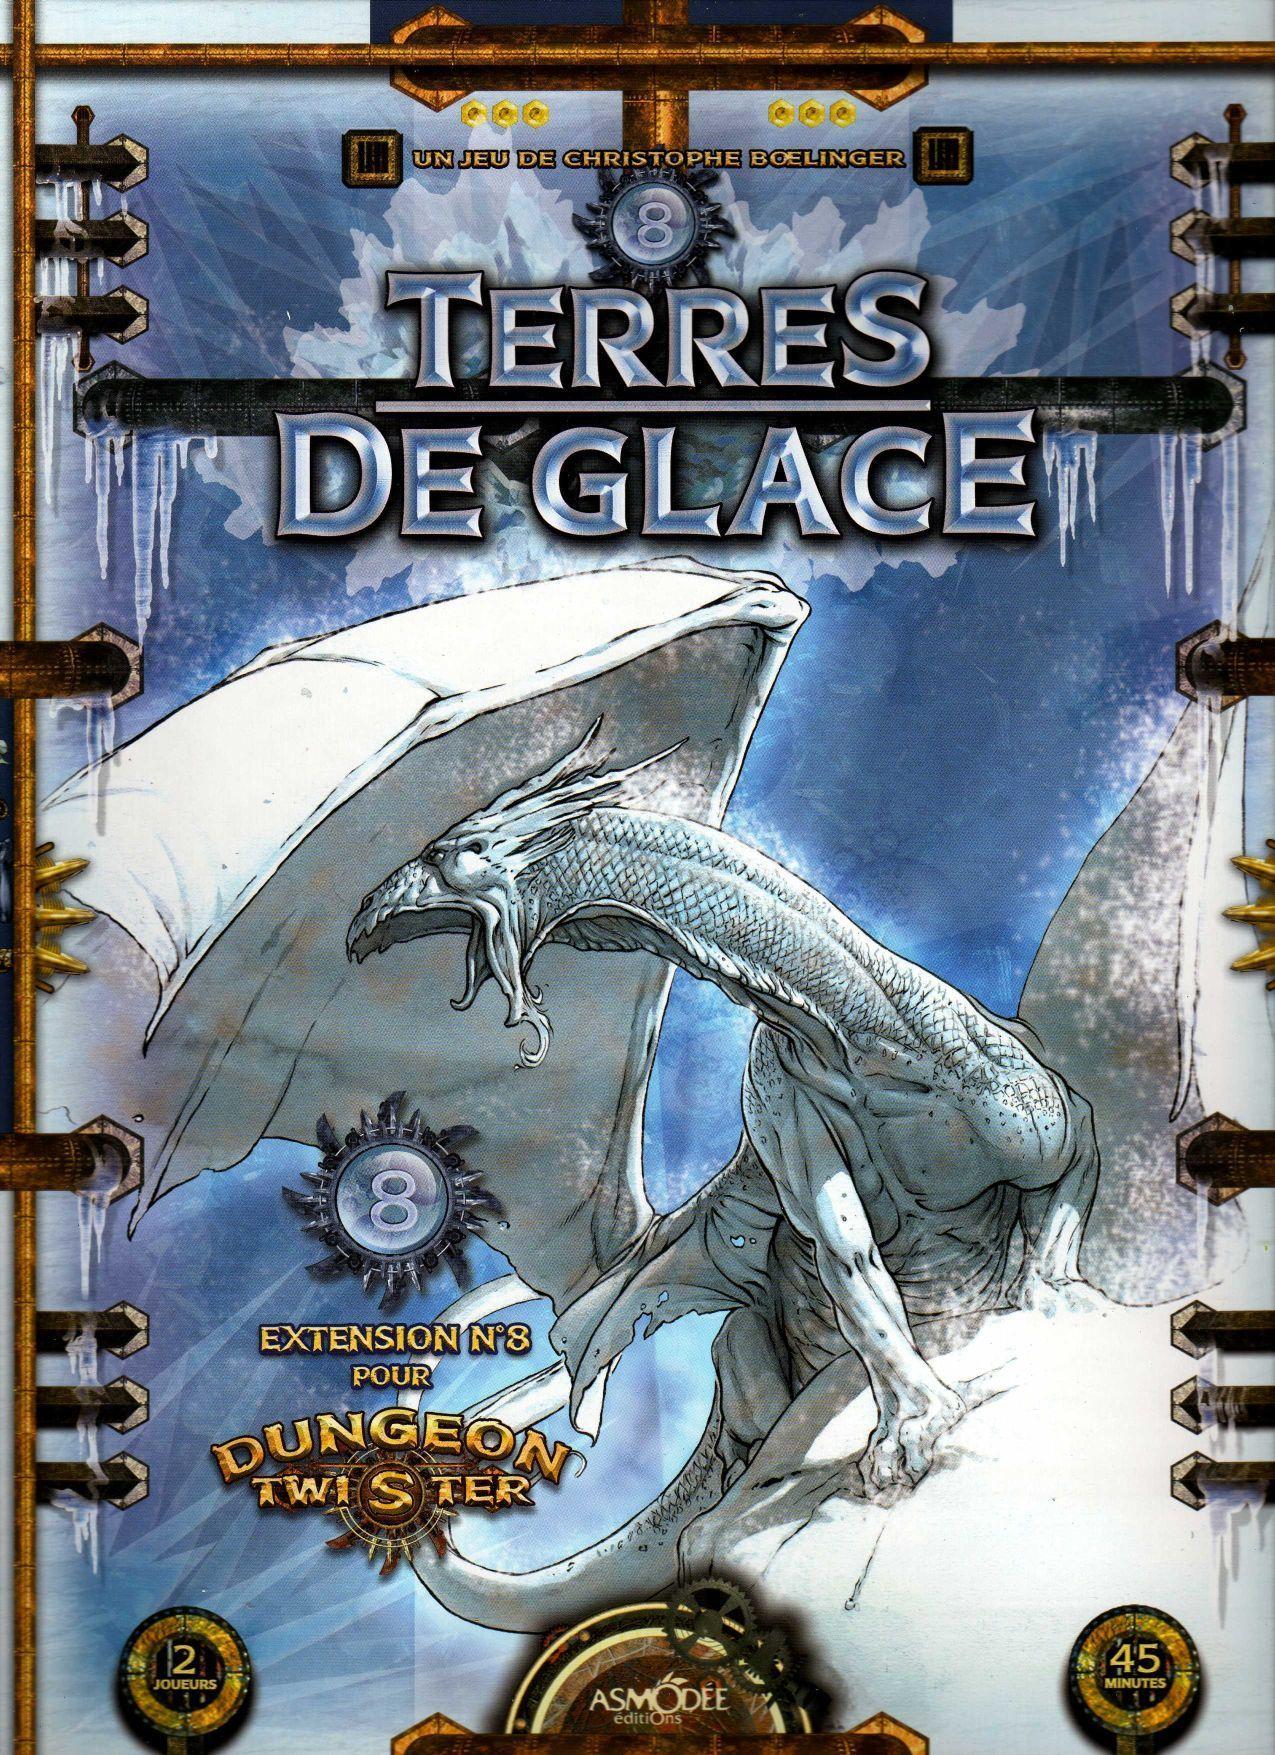 Dungeon Twister: Terres de Glace